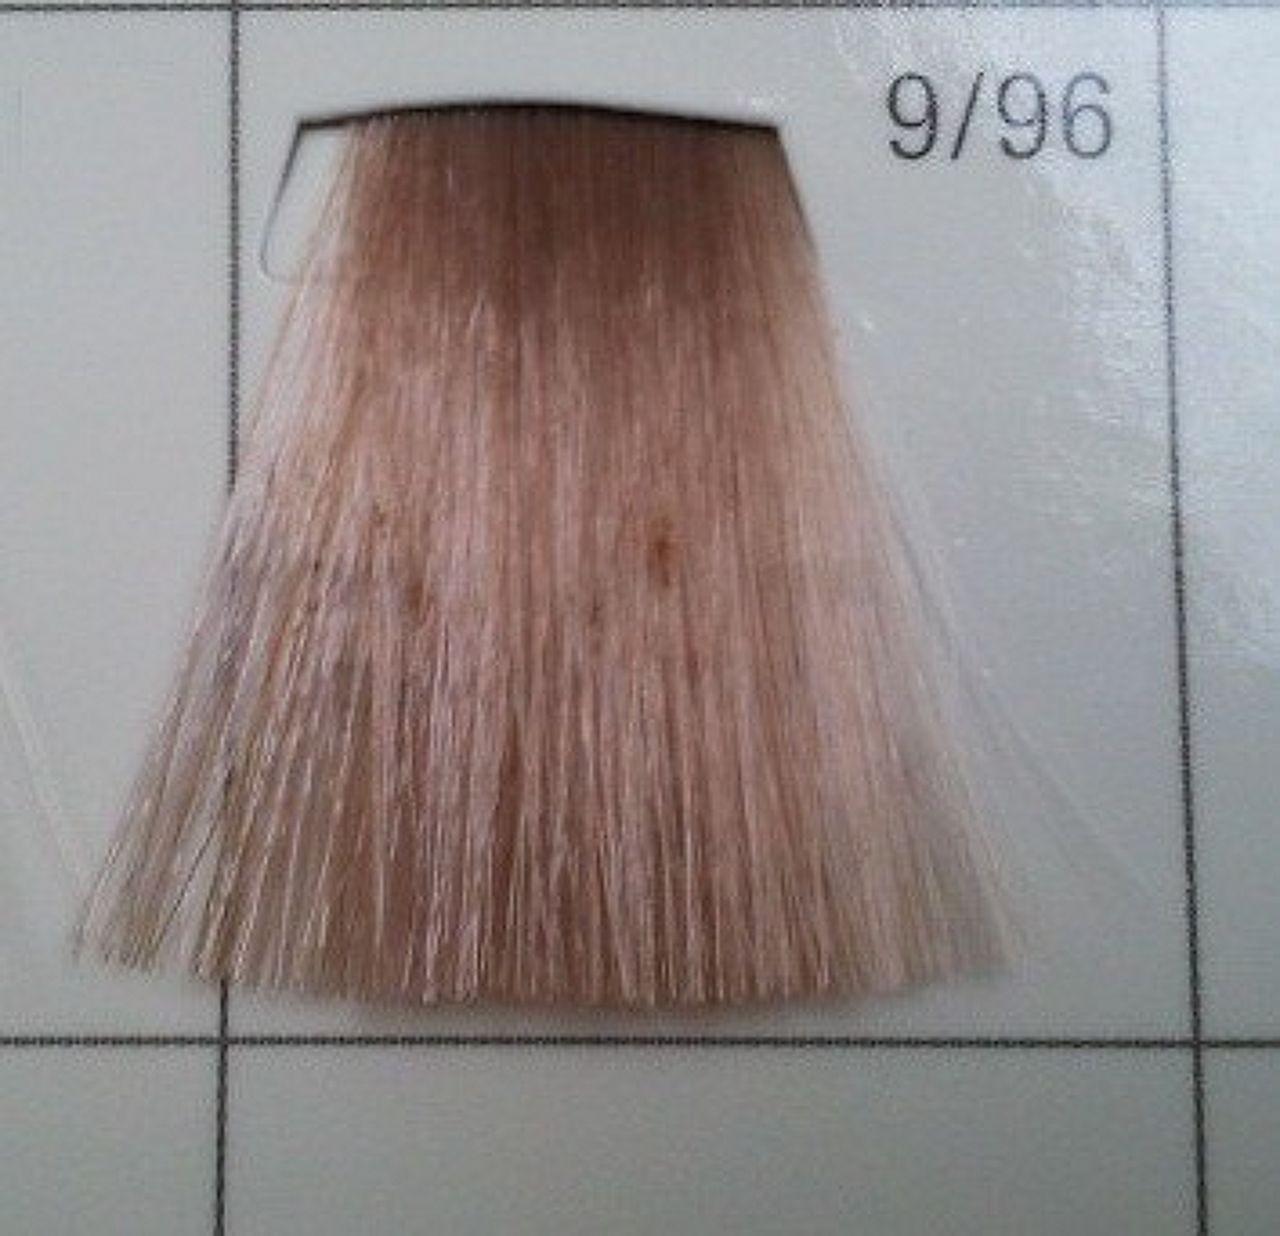 Vopsea De Par Permanenta Wella, Koleston Perfect, Nuanta 9/96, 60 Ml imagine produs